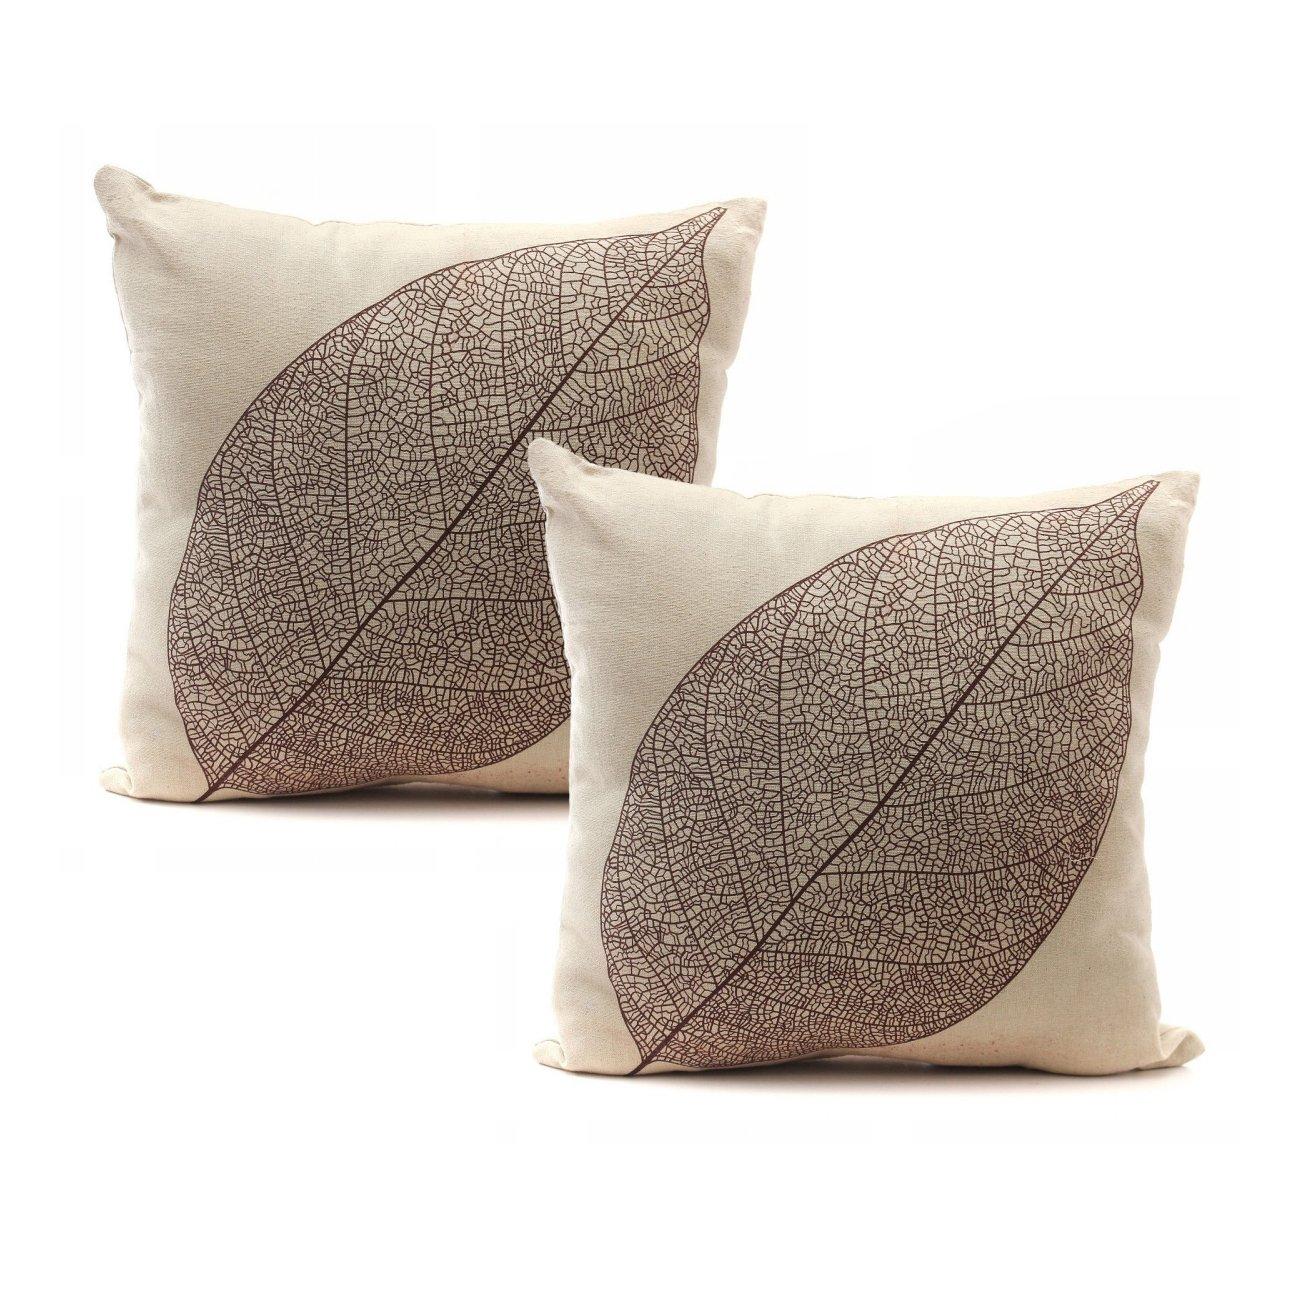 Luxbon set of 2pcs rustic farmhouse leaves decor cotton linen throw pillow cases sofa couch chair decorative cushion covers 18x18 45x45cm insert not